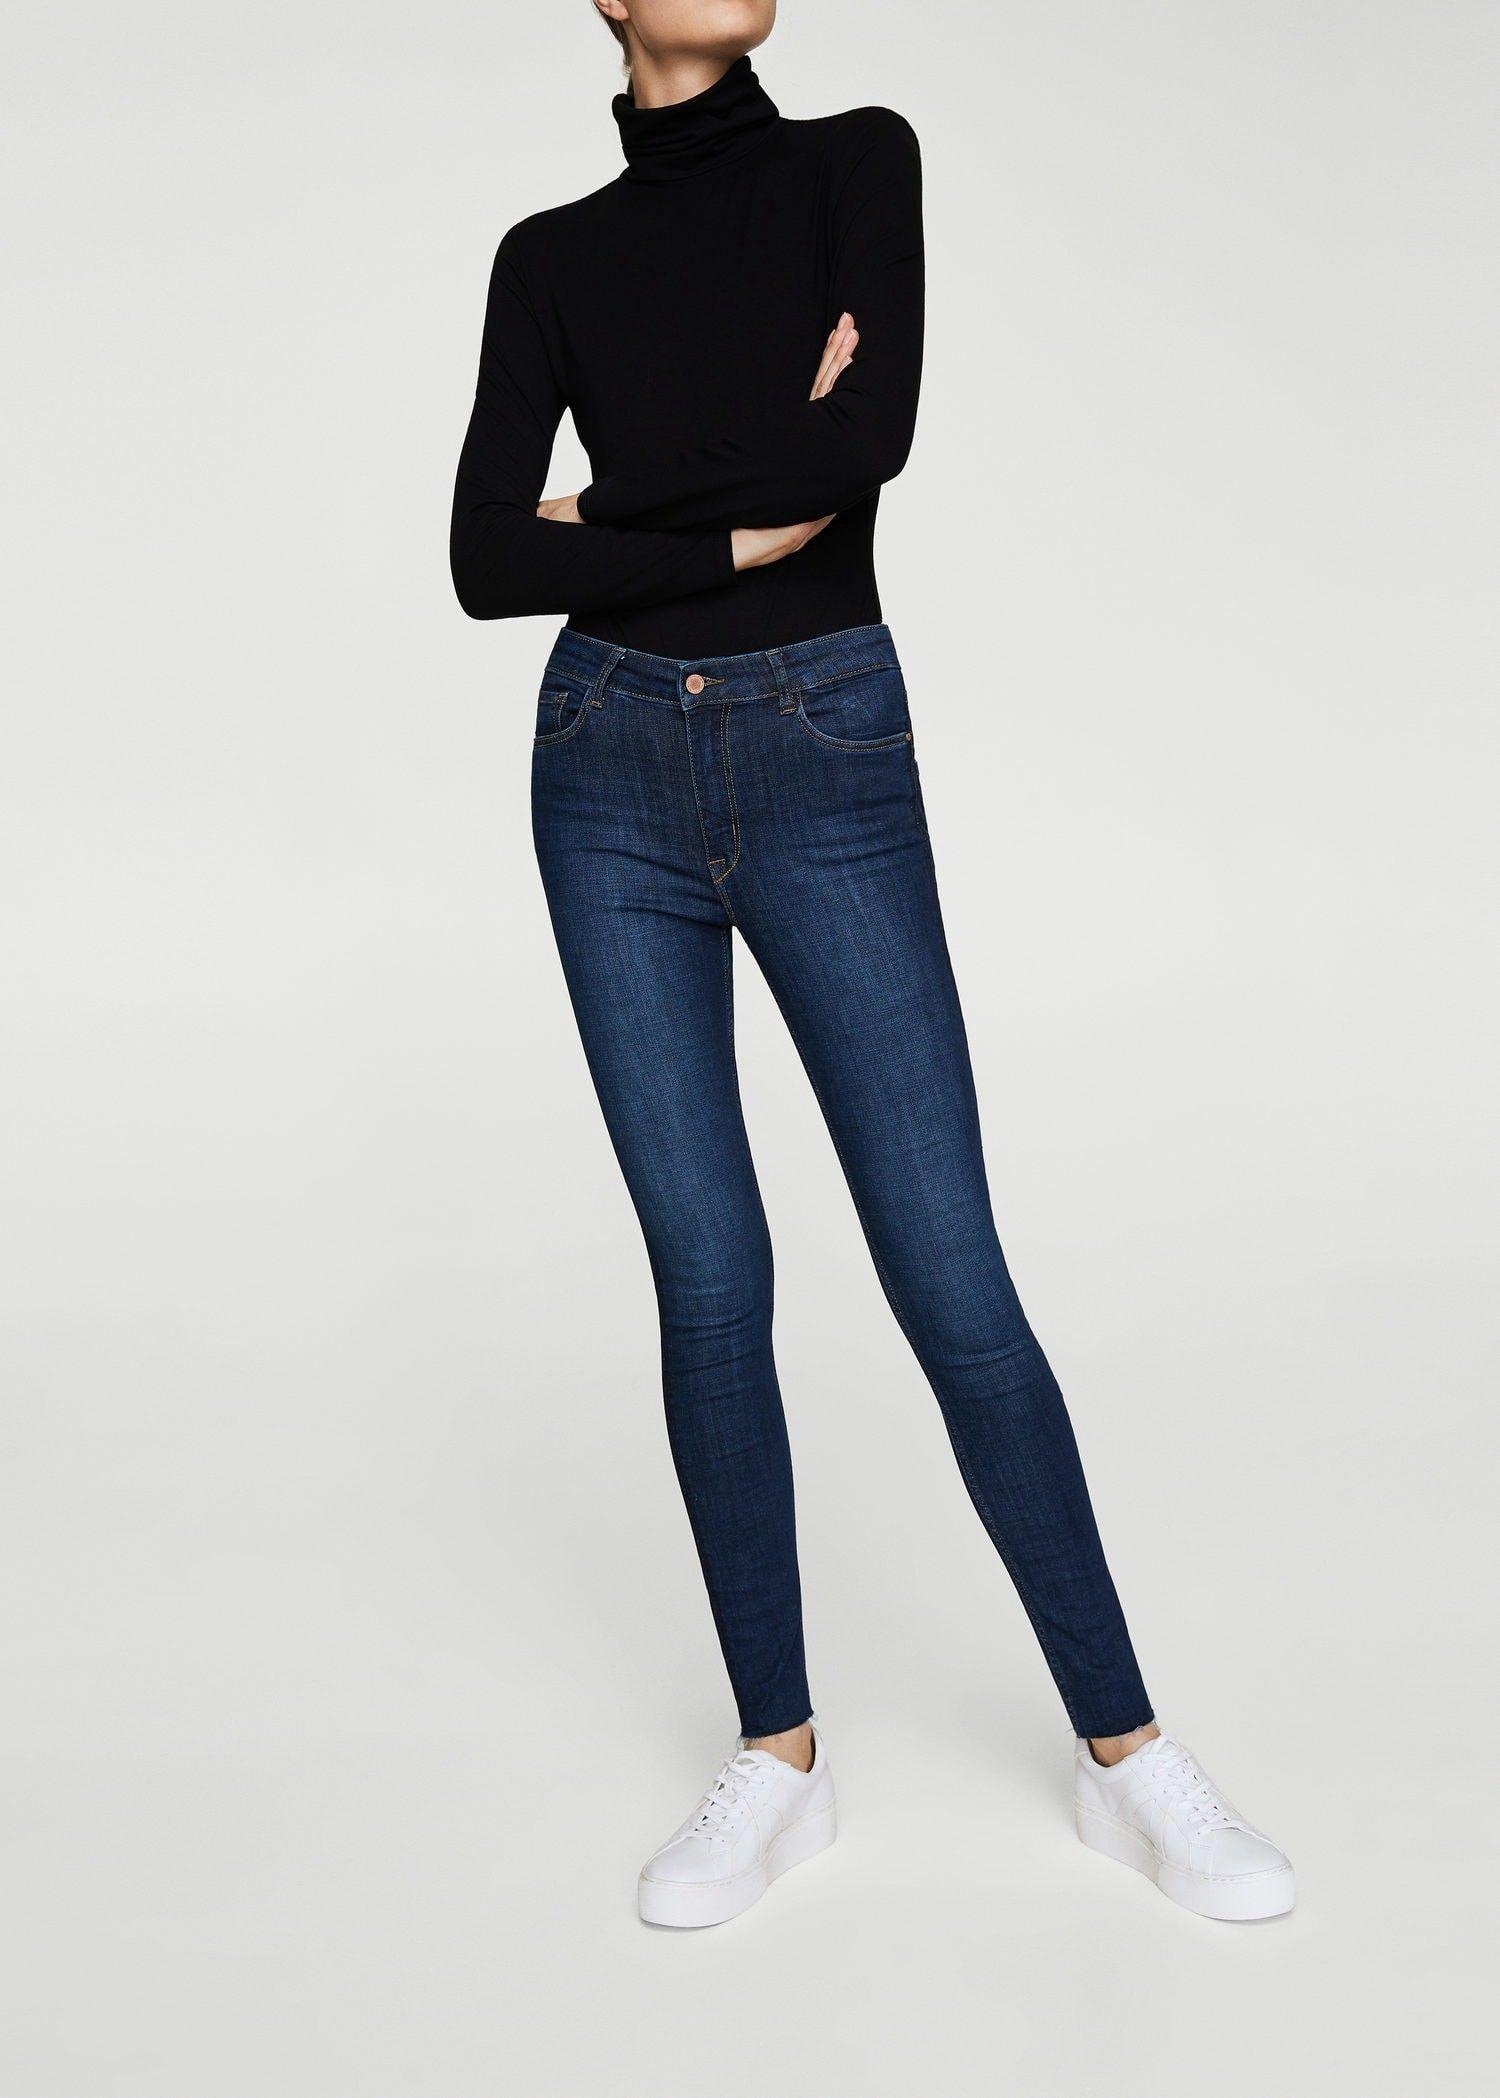 b3483eec1e Mango Soho Skinny Jeans - Women   12   Products   Jeans, Skinny ...